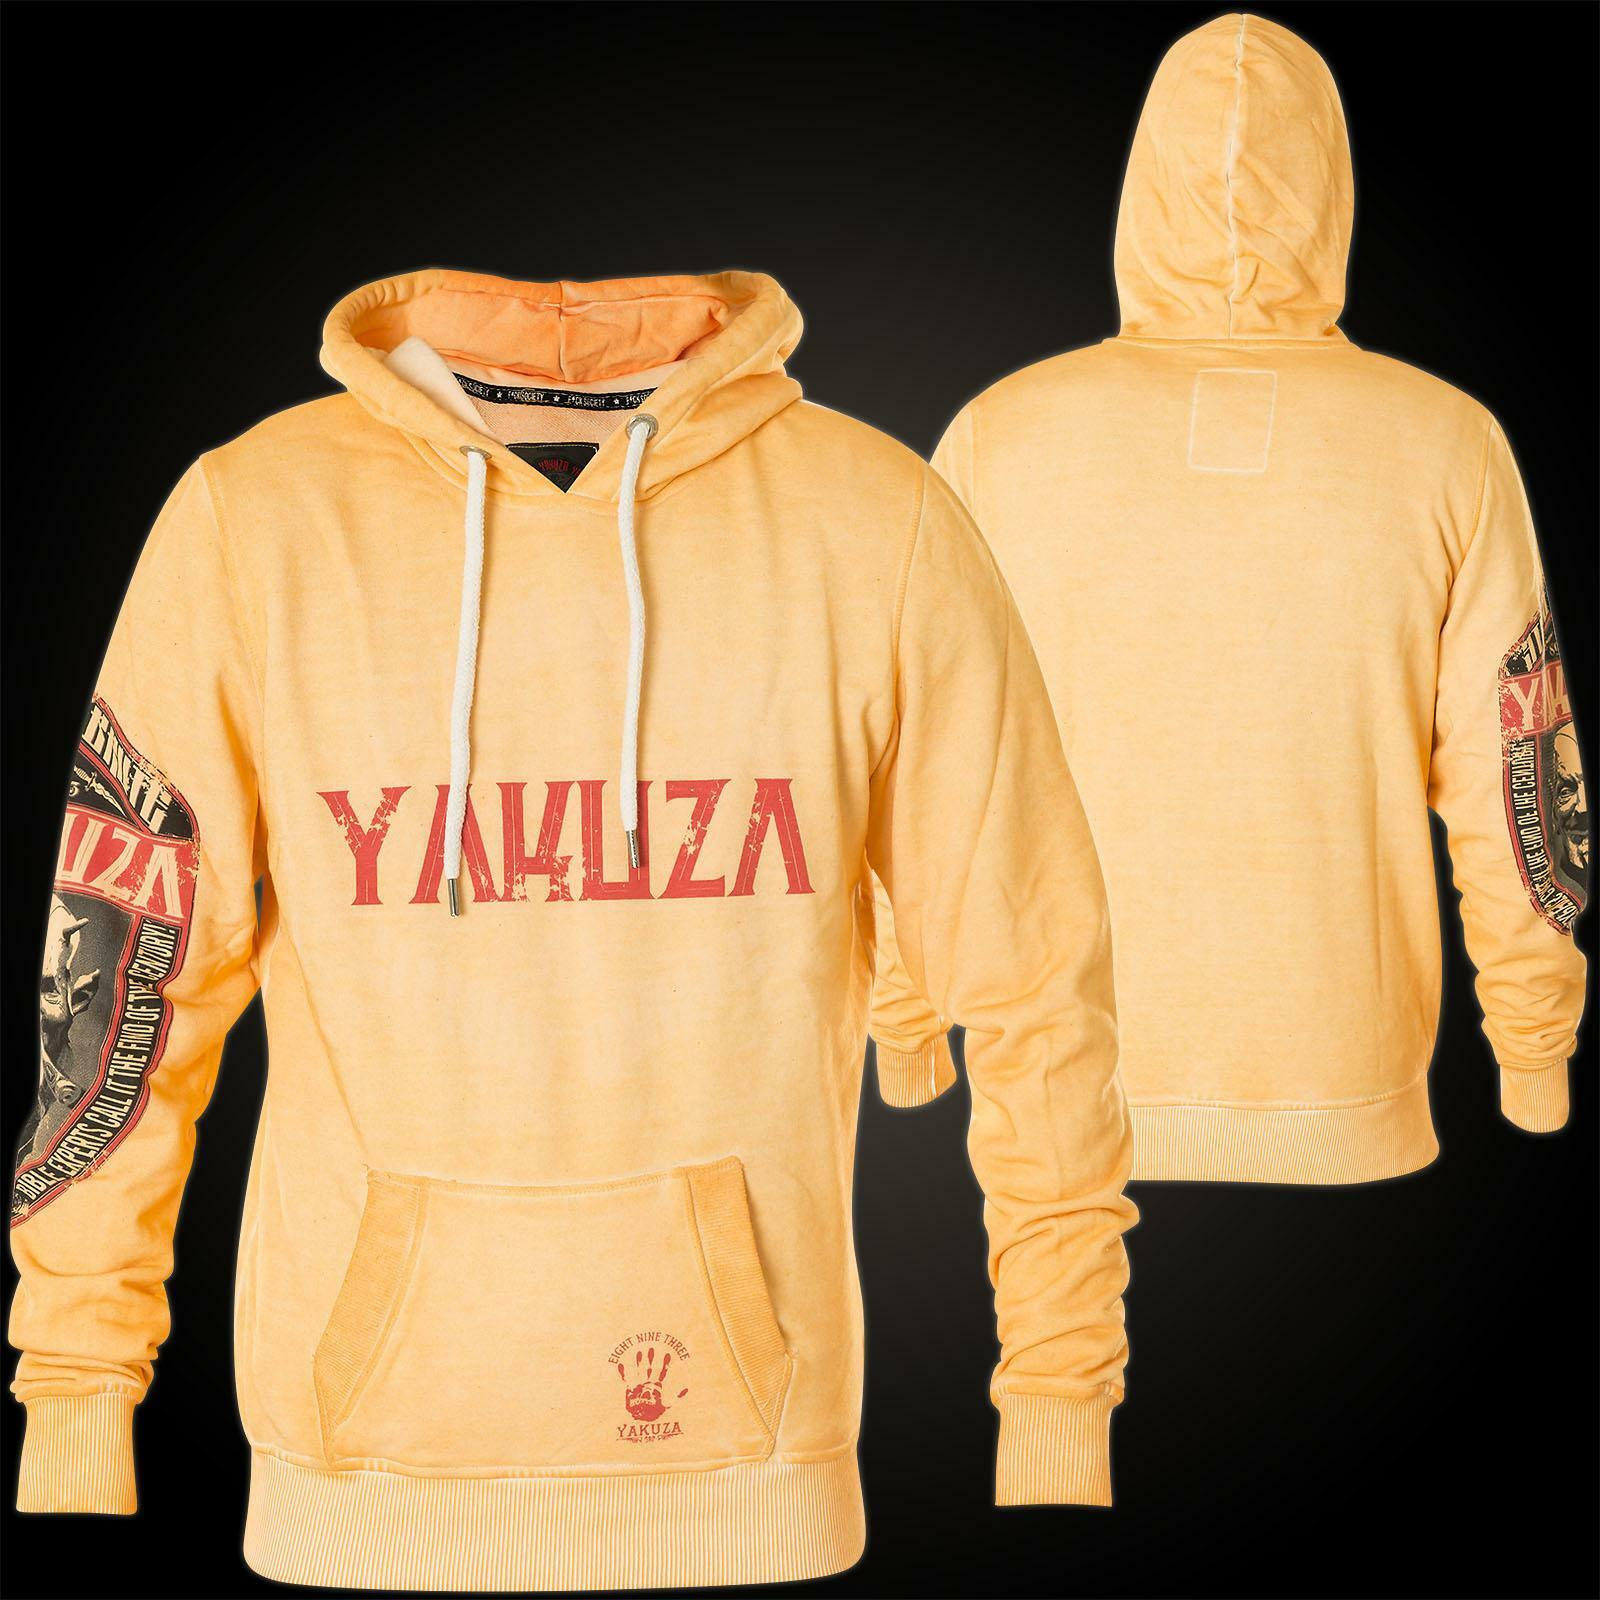 Yakuza Hoody Brute Devil HOB-9025 Warm Apricot